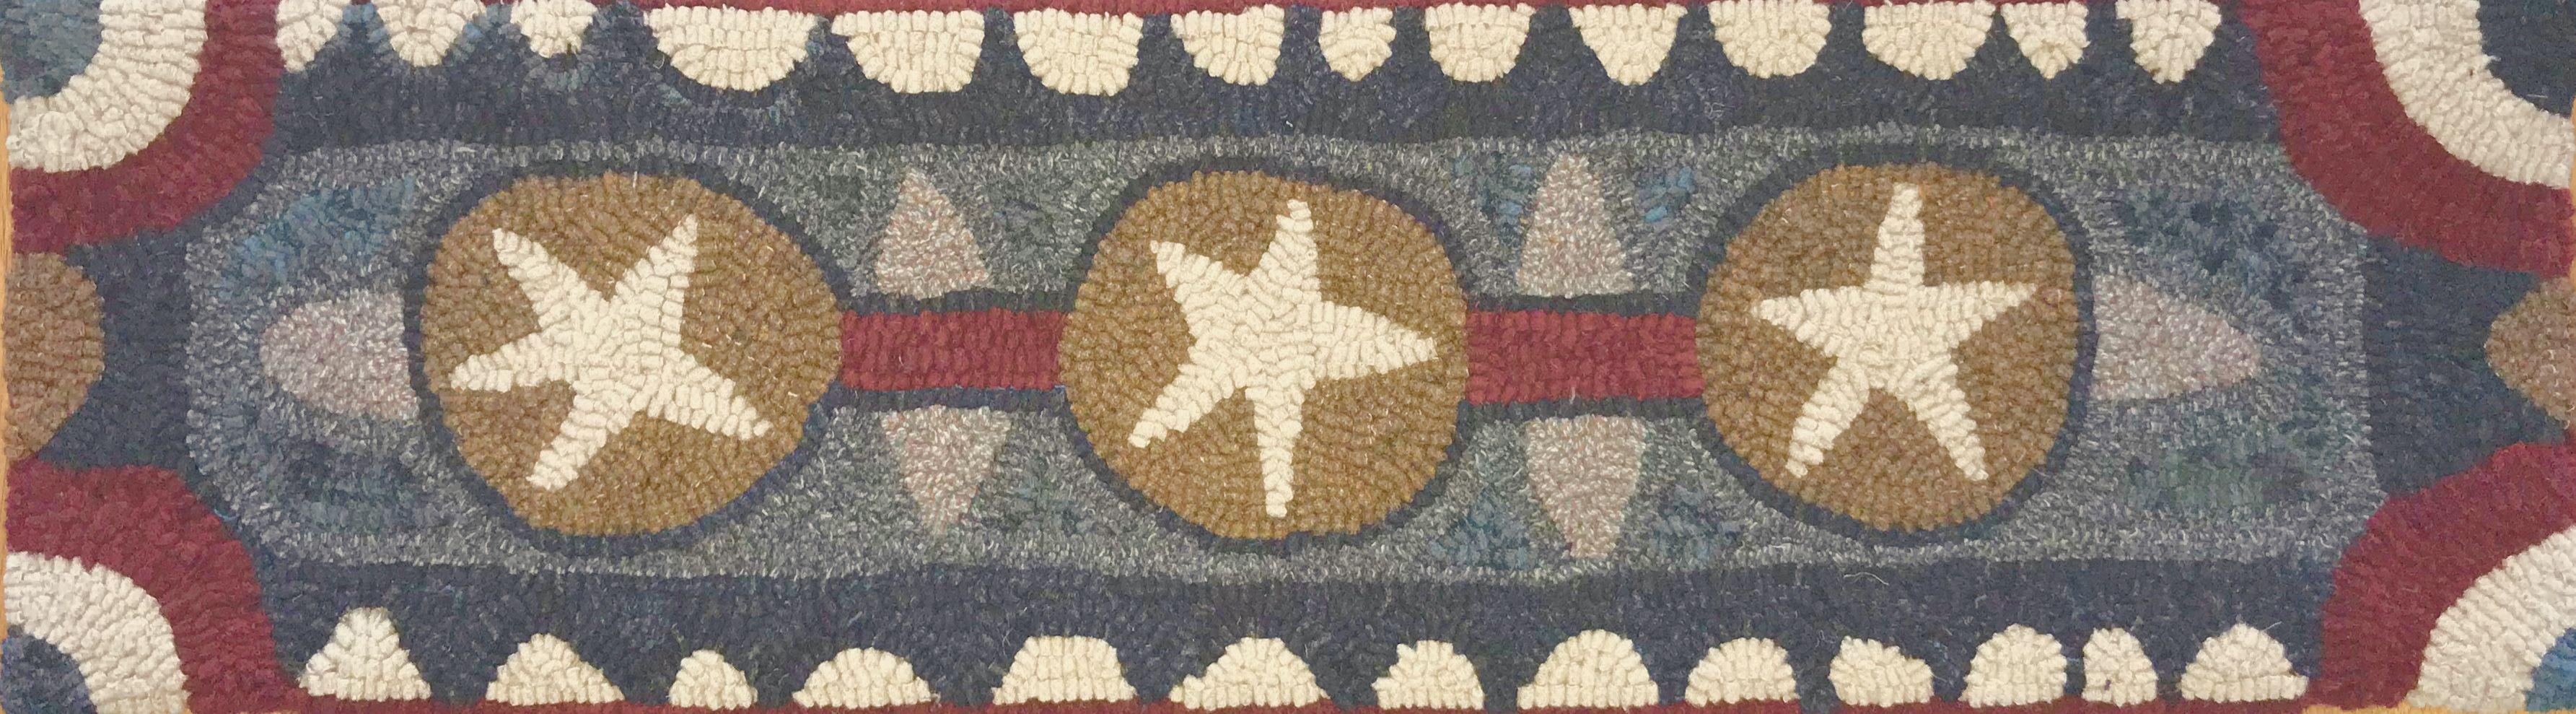 Pattern Designed By Darci Spilman From Woolen Folk Art Rug